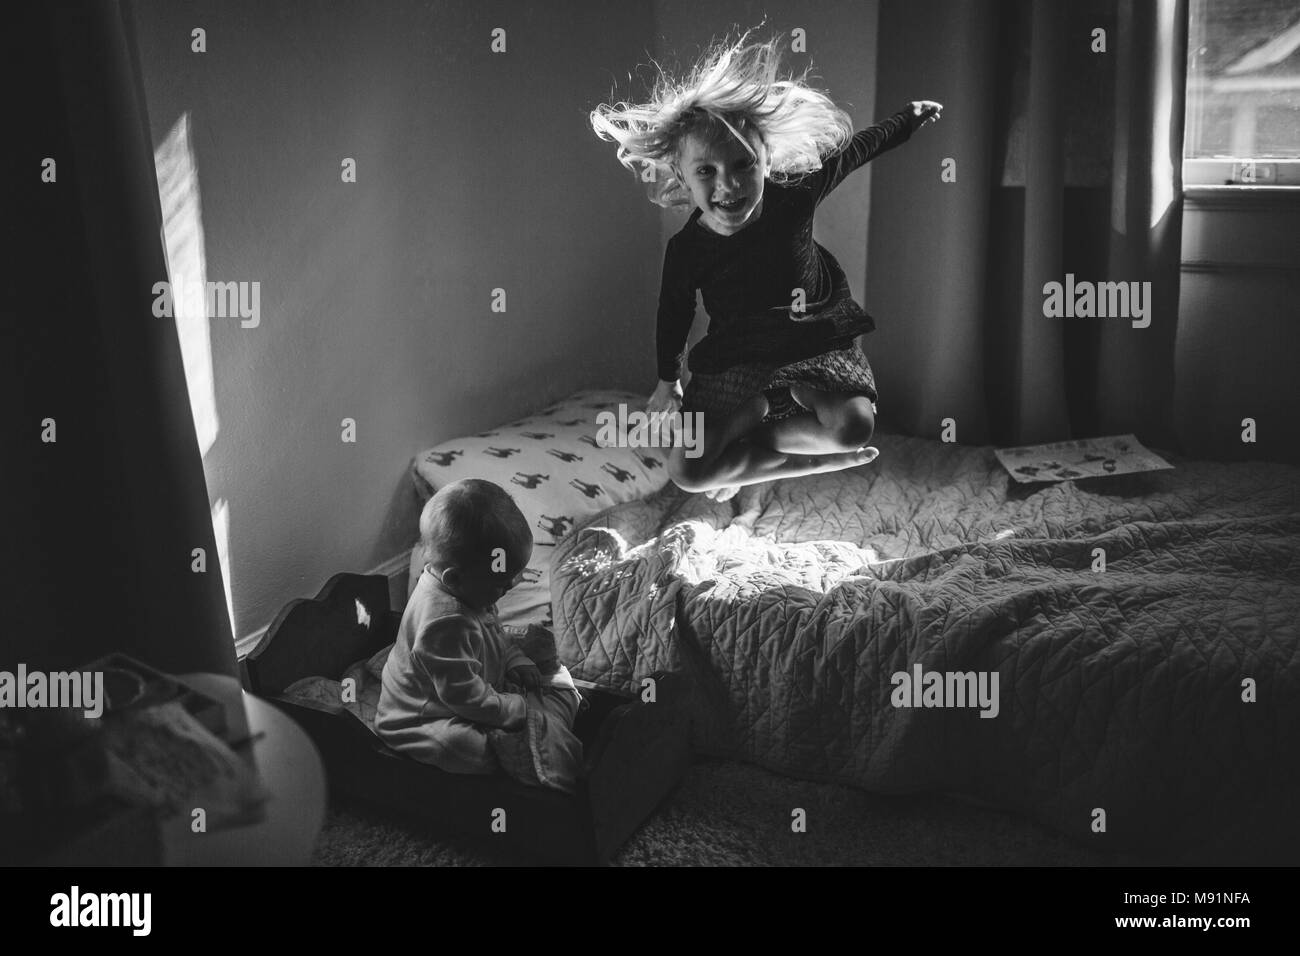 Chica salta sobre la cama de sol Imagen De Stock